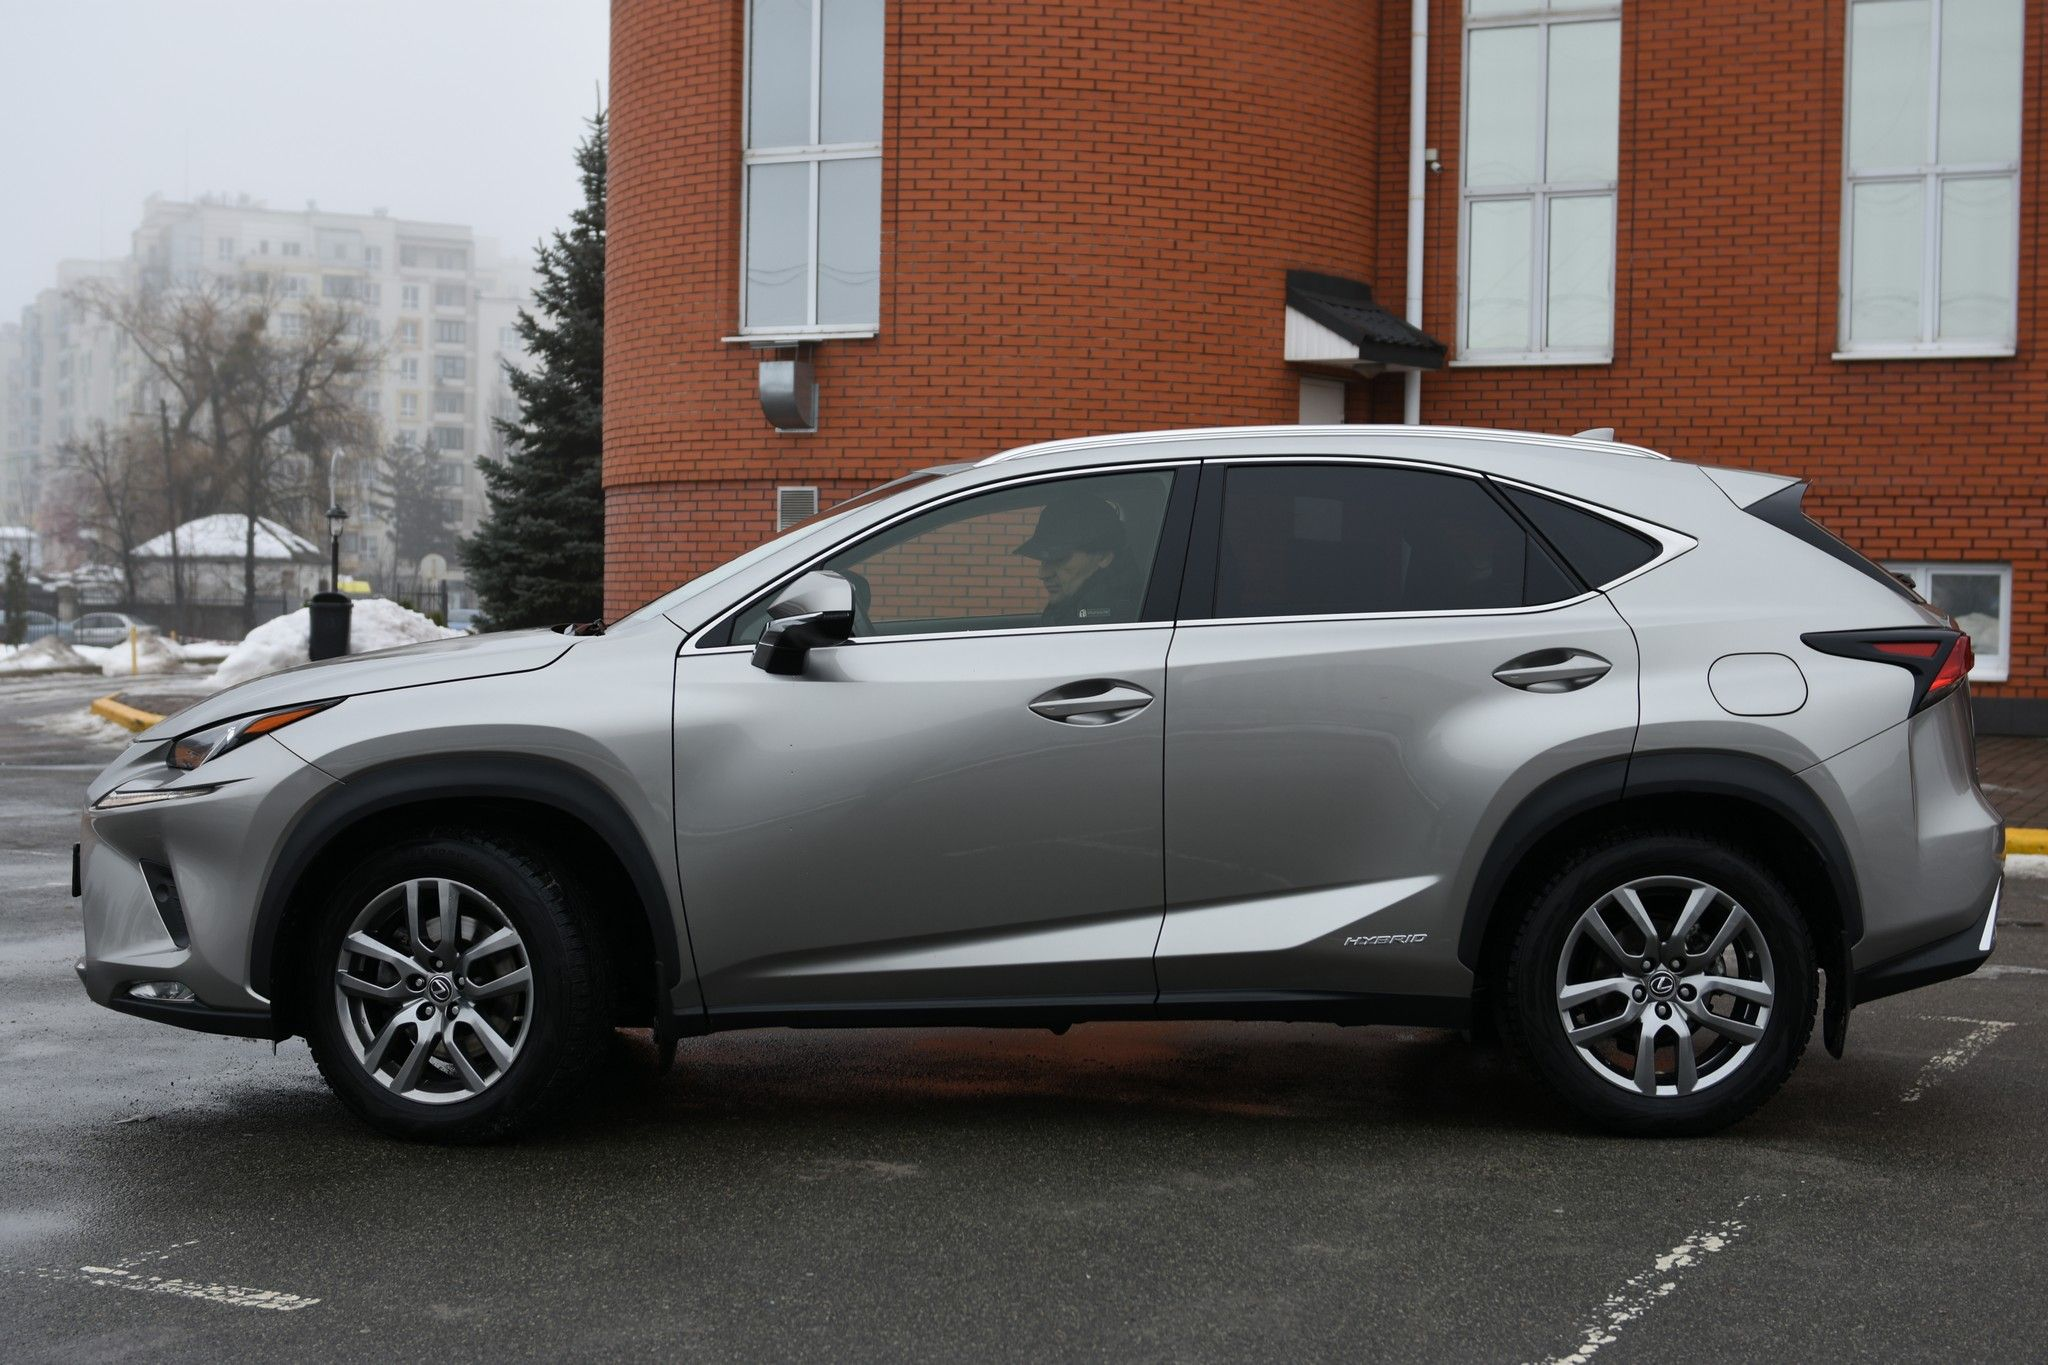 AUTO.RIA – Продам Лексус НХ 200 2019 бензин внедорожник ...   1365x2048